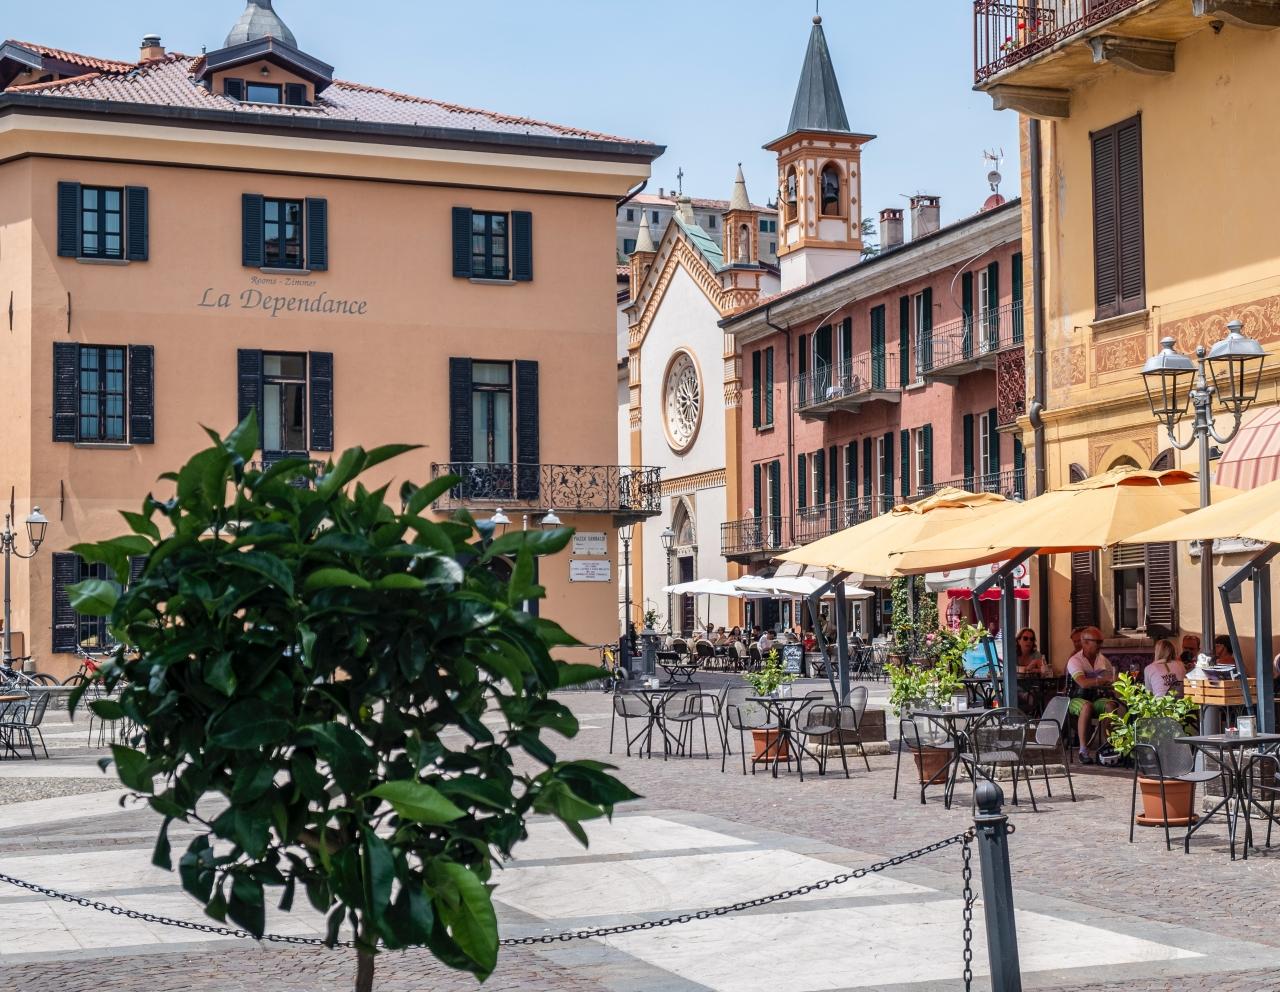 villa_del_balbianello_ter_kis_templommal_00176_kicsik.jpg